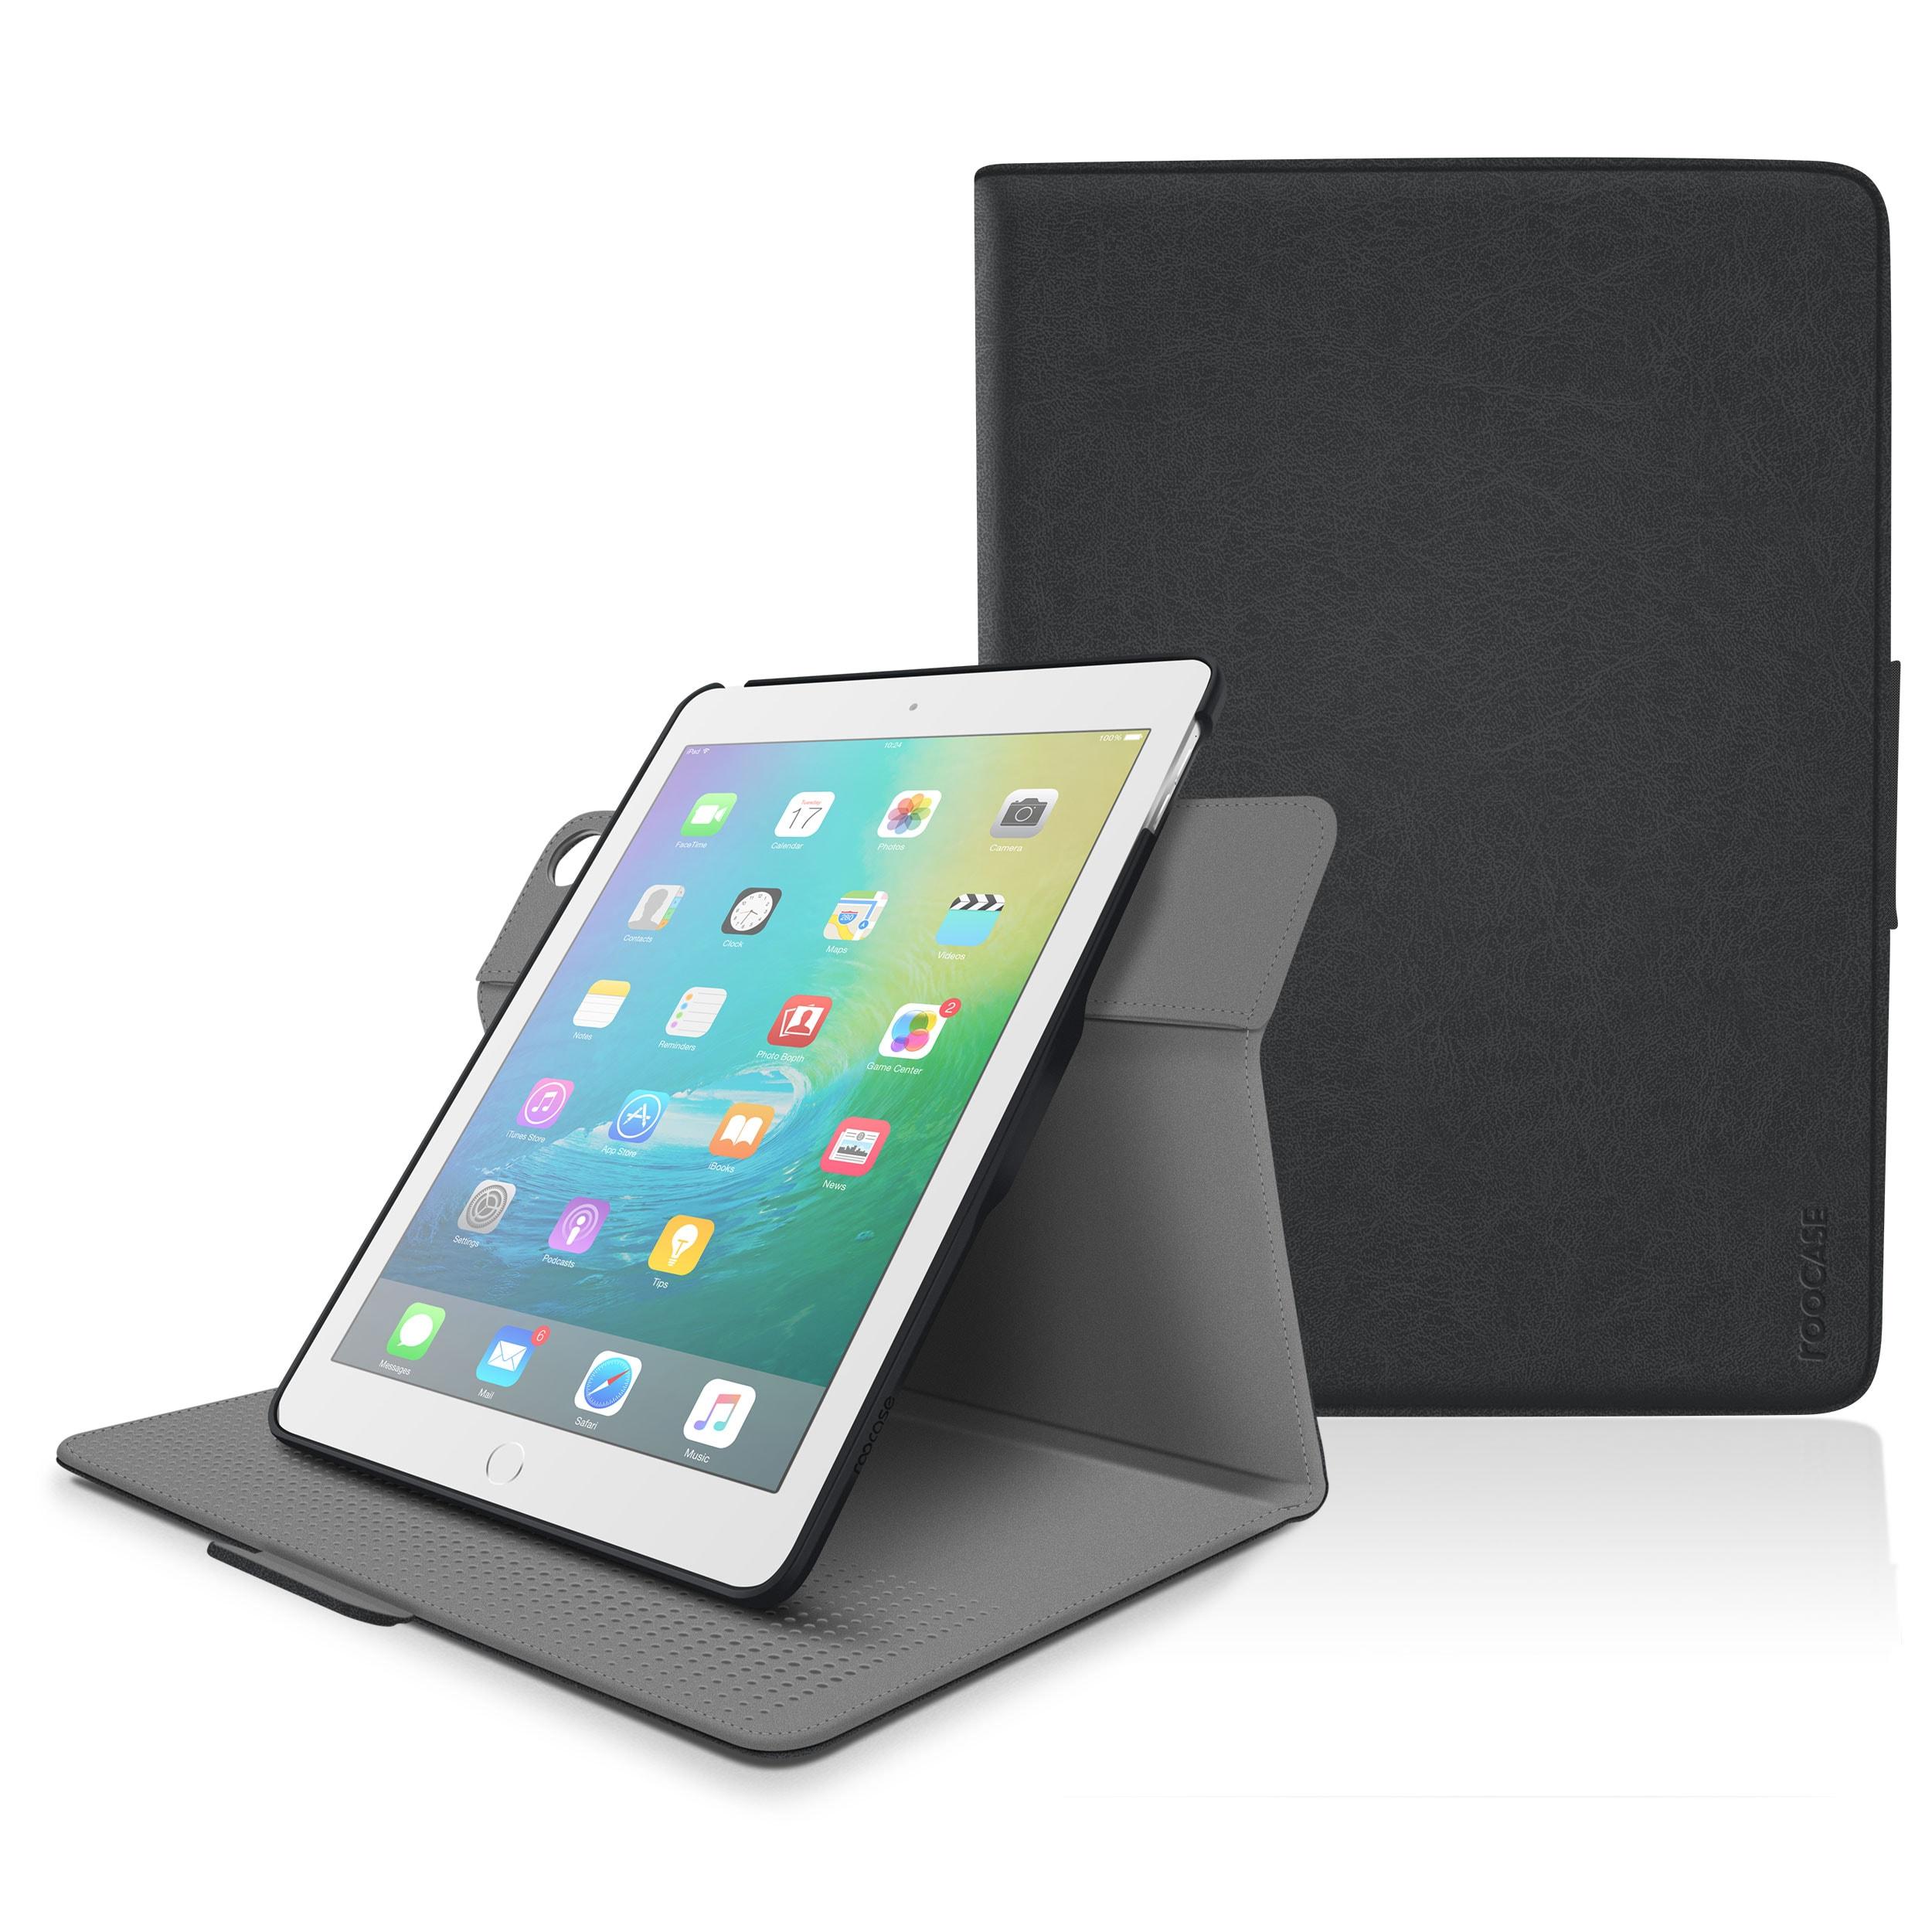 roocase Orb Folio Case for Apple iPad Air 2